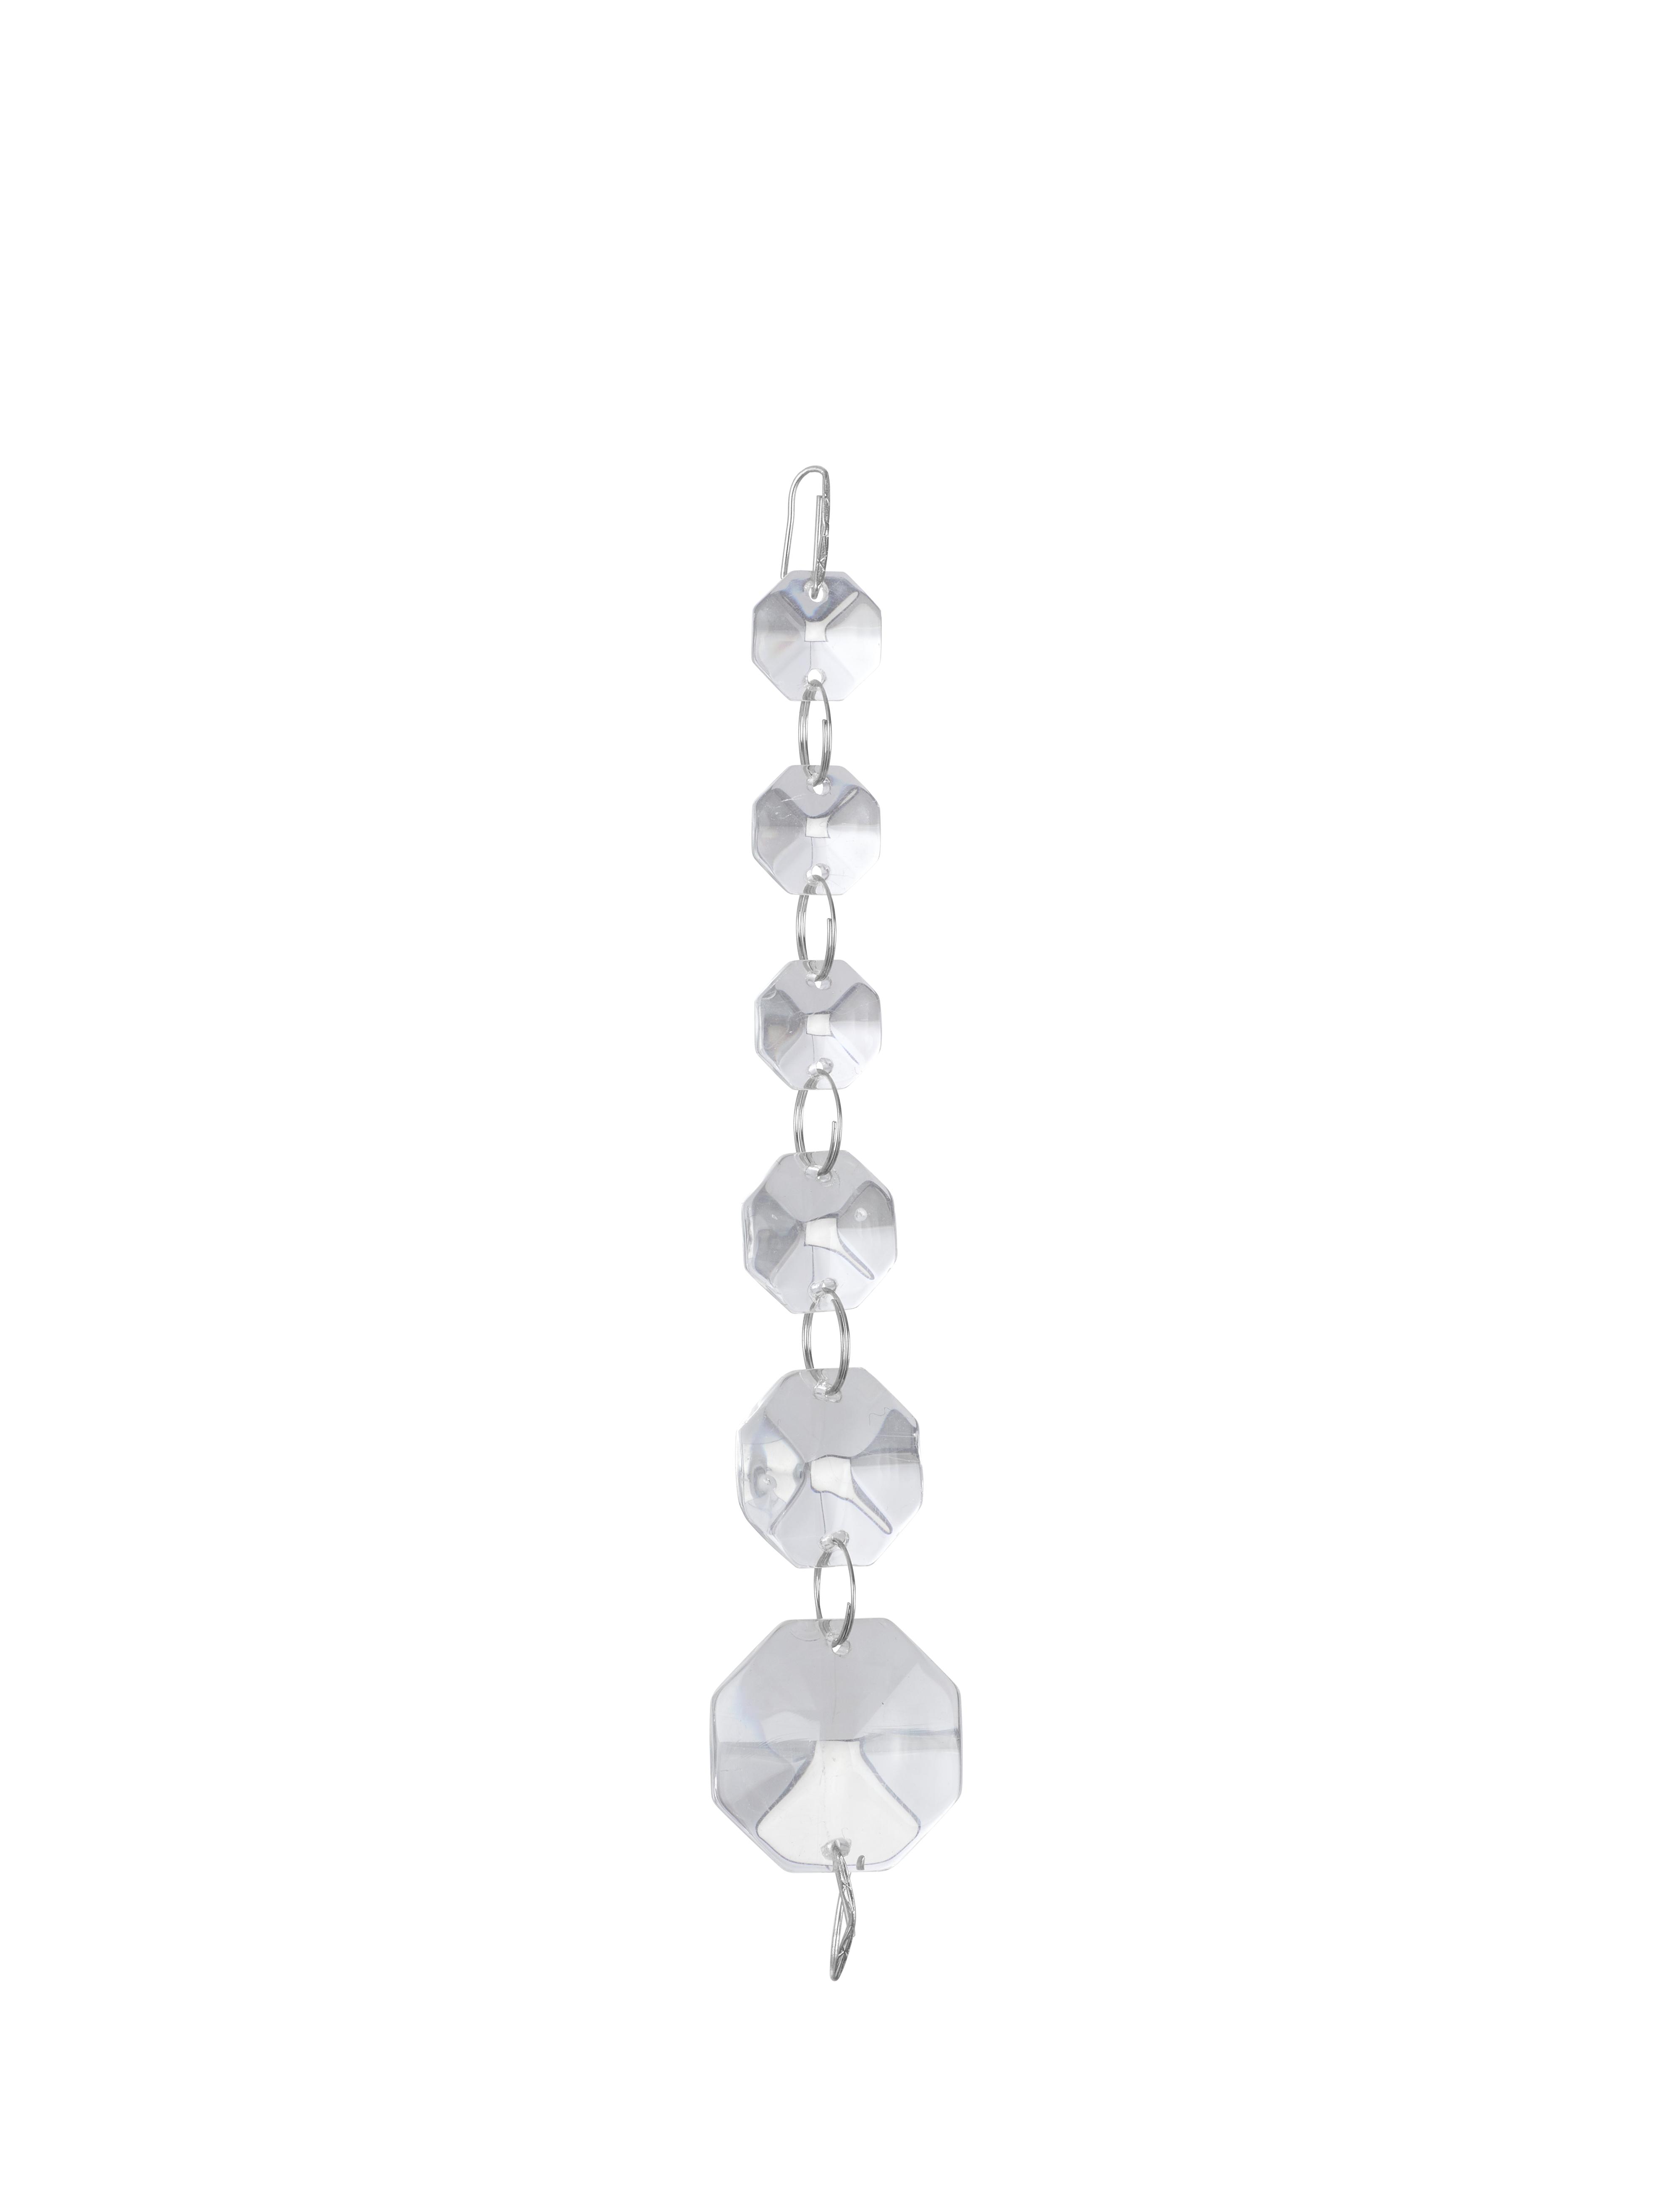 Prisms - Lower Lenght Gränsö 104889